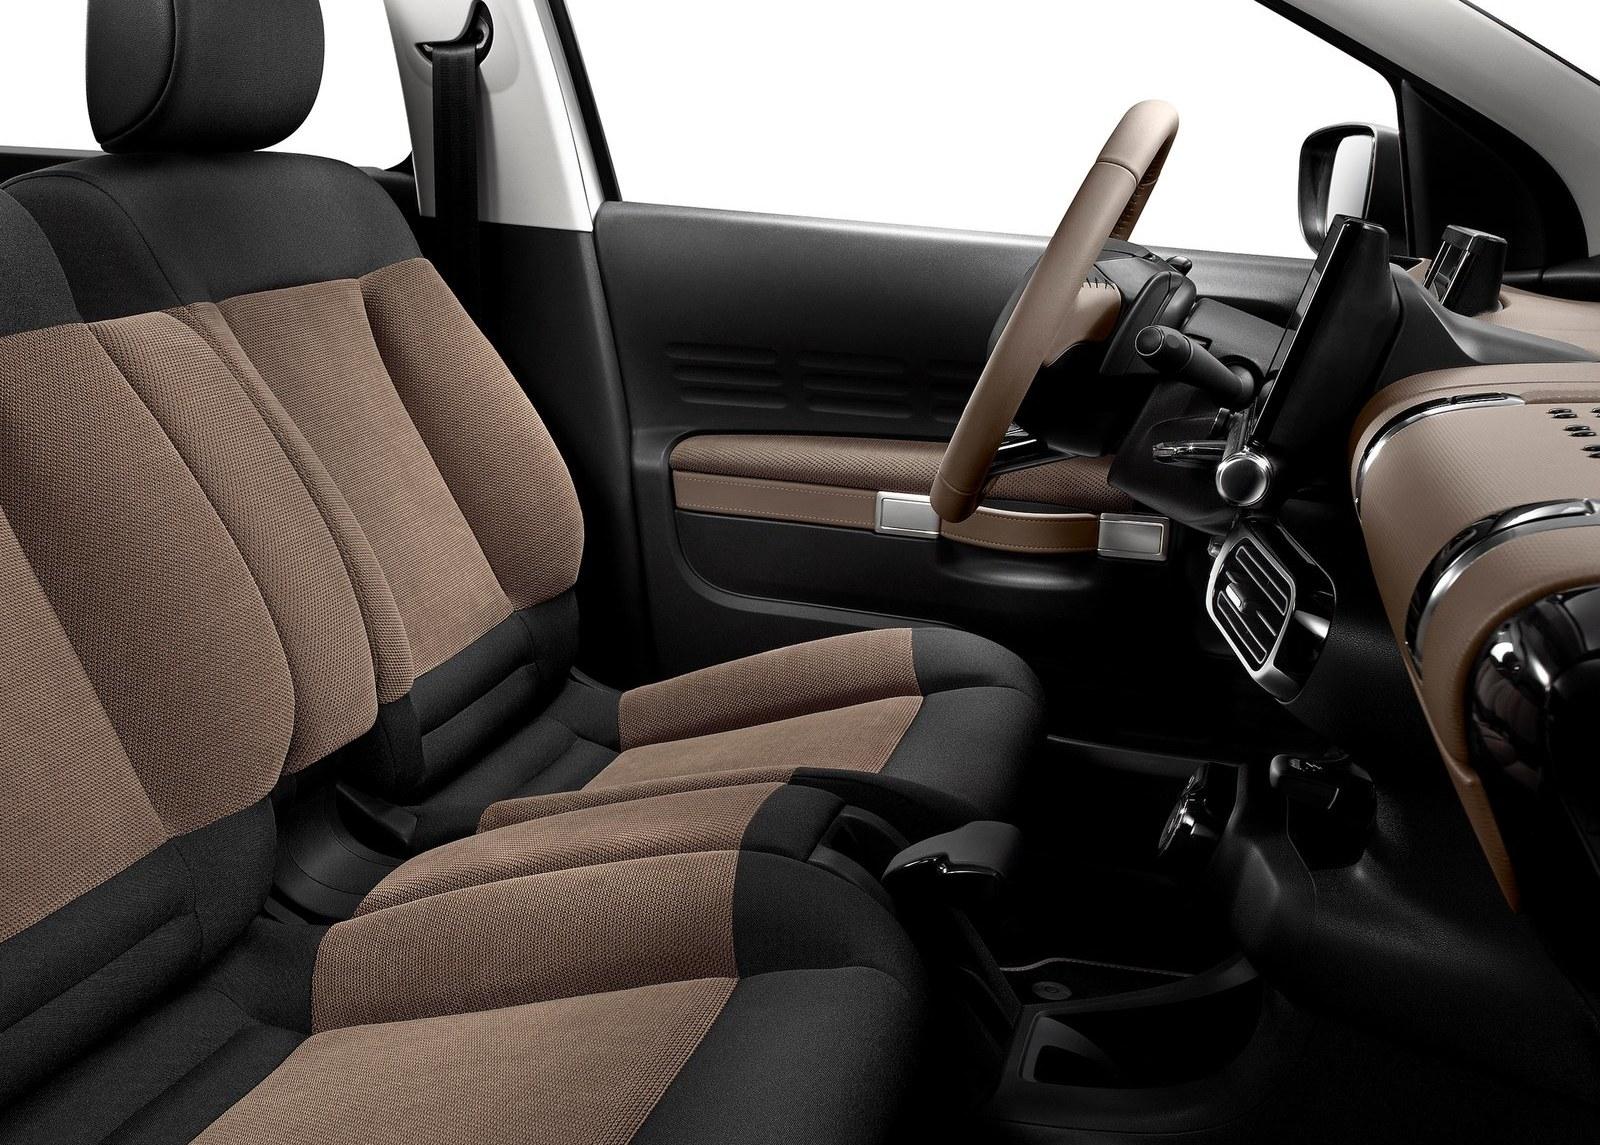 2015 Citroen C4 Cactus Front Seats